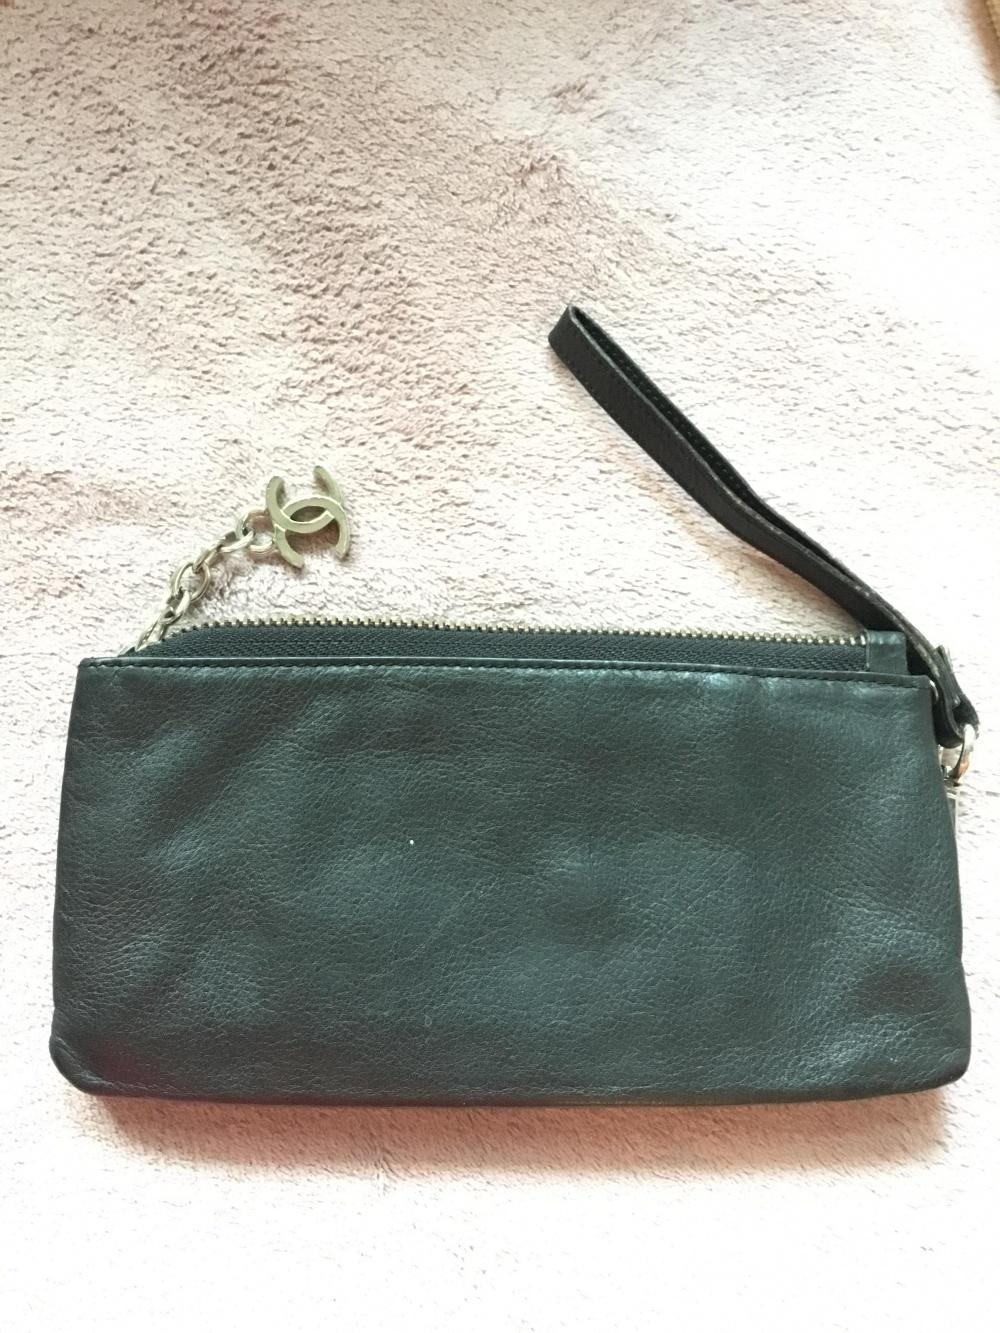 Клатч кошелек Chanel, реплика, размер 19*9